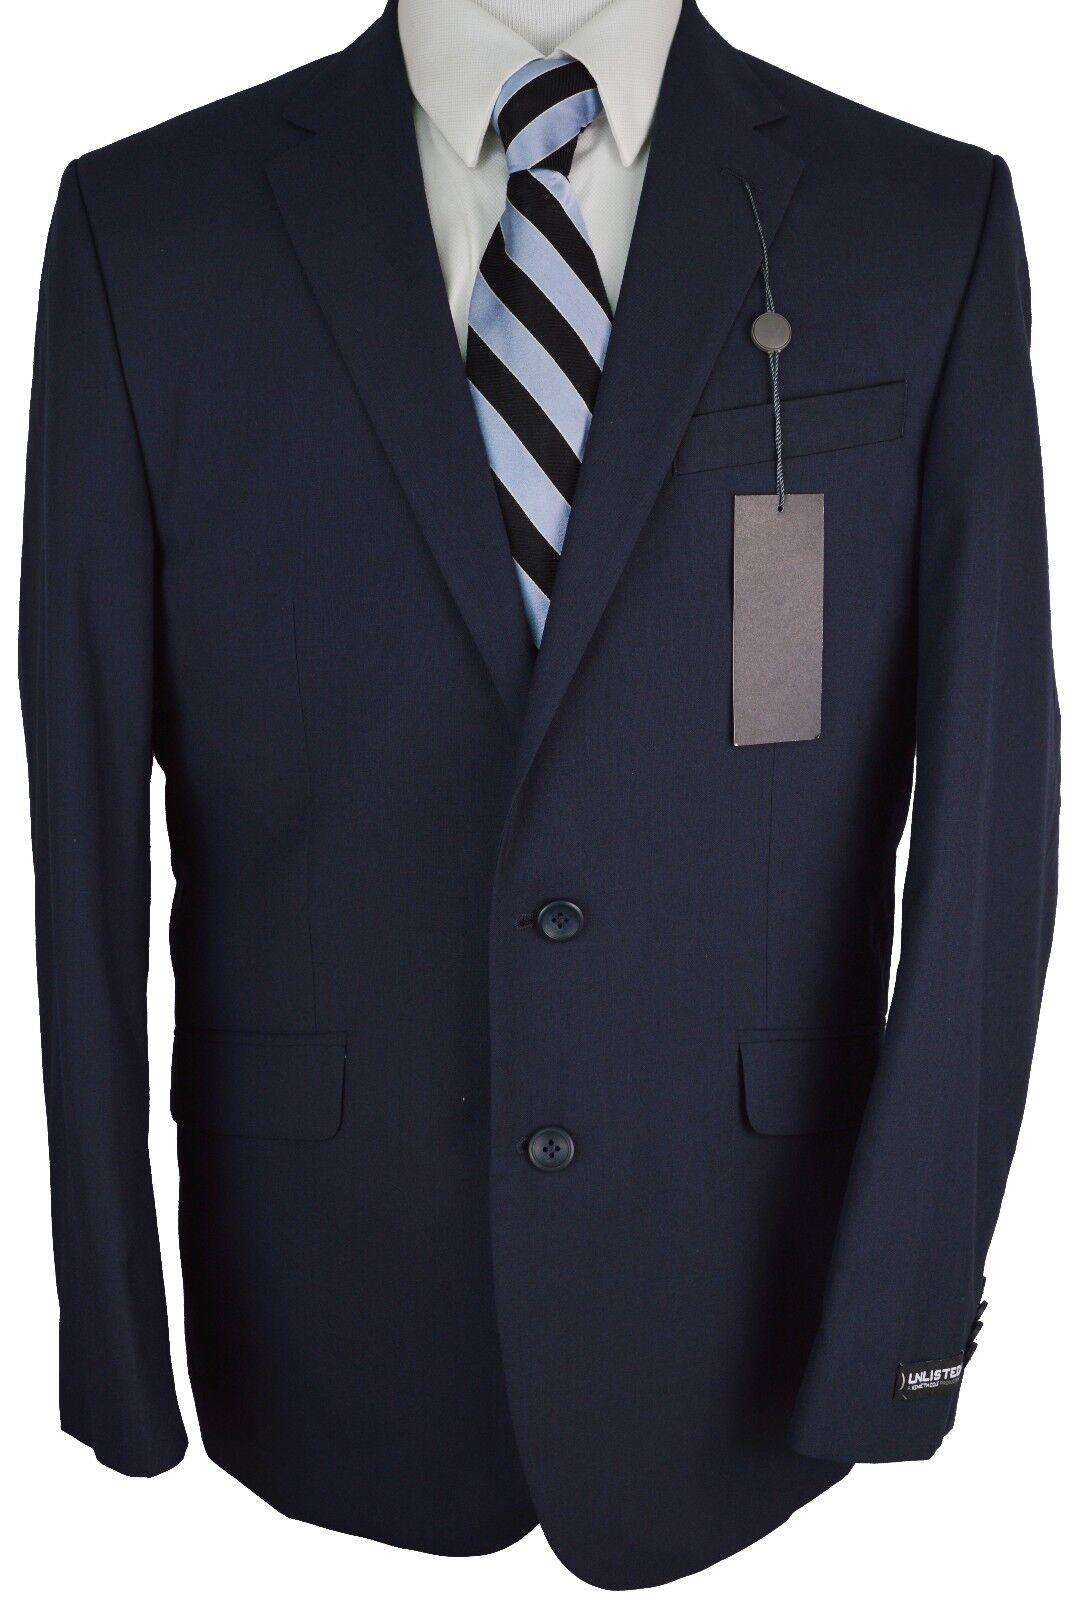 X19 NEW UNLISTED Solid Navy Blau Two Button Blazer 44 Regular 395